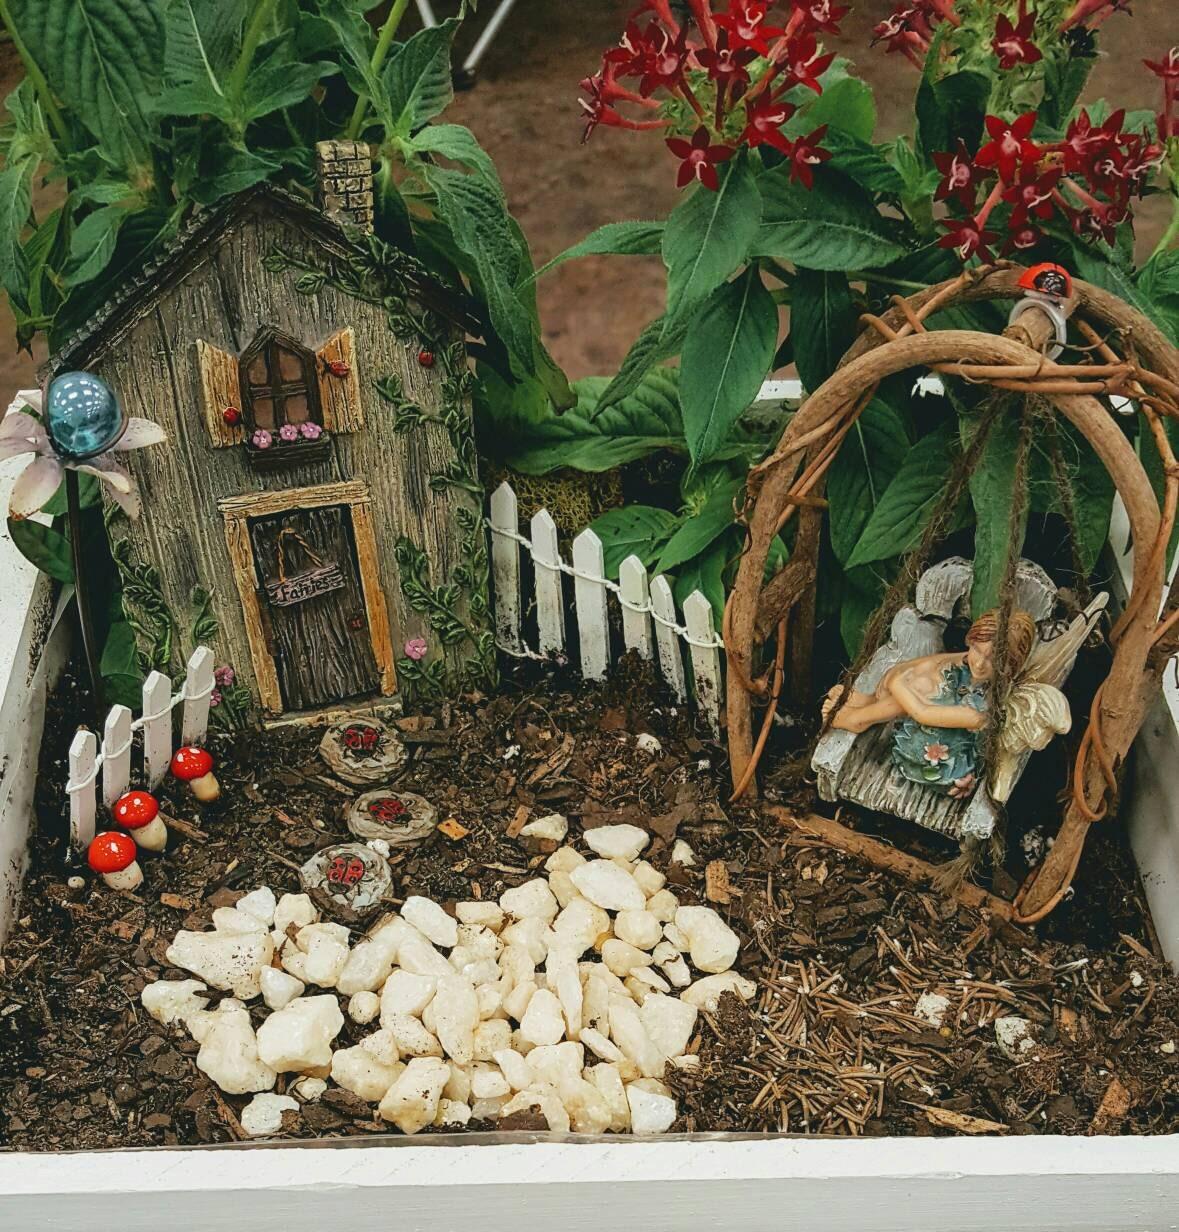 Ladybug fairy garden kit 2 king alfred daffodil bulbs for Fairy garden kits